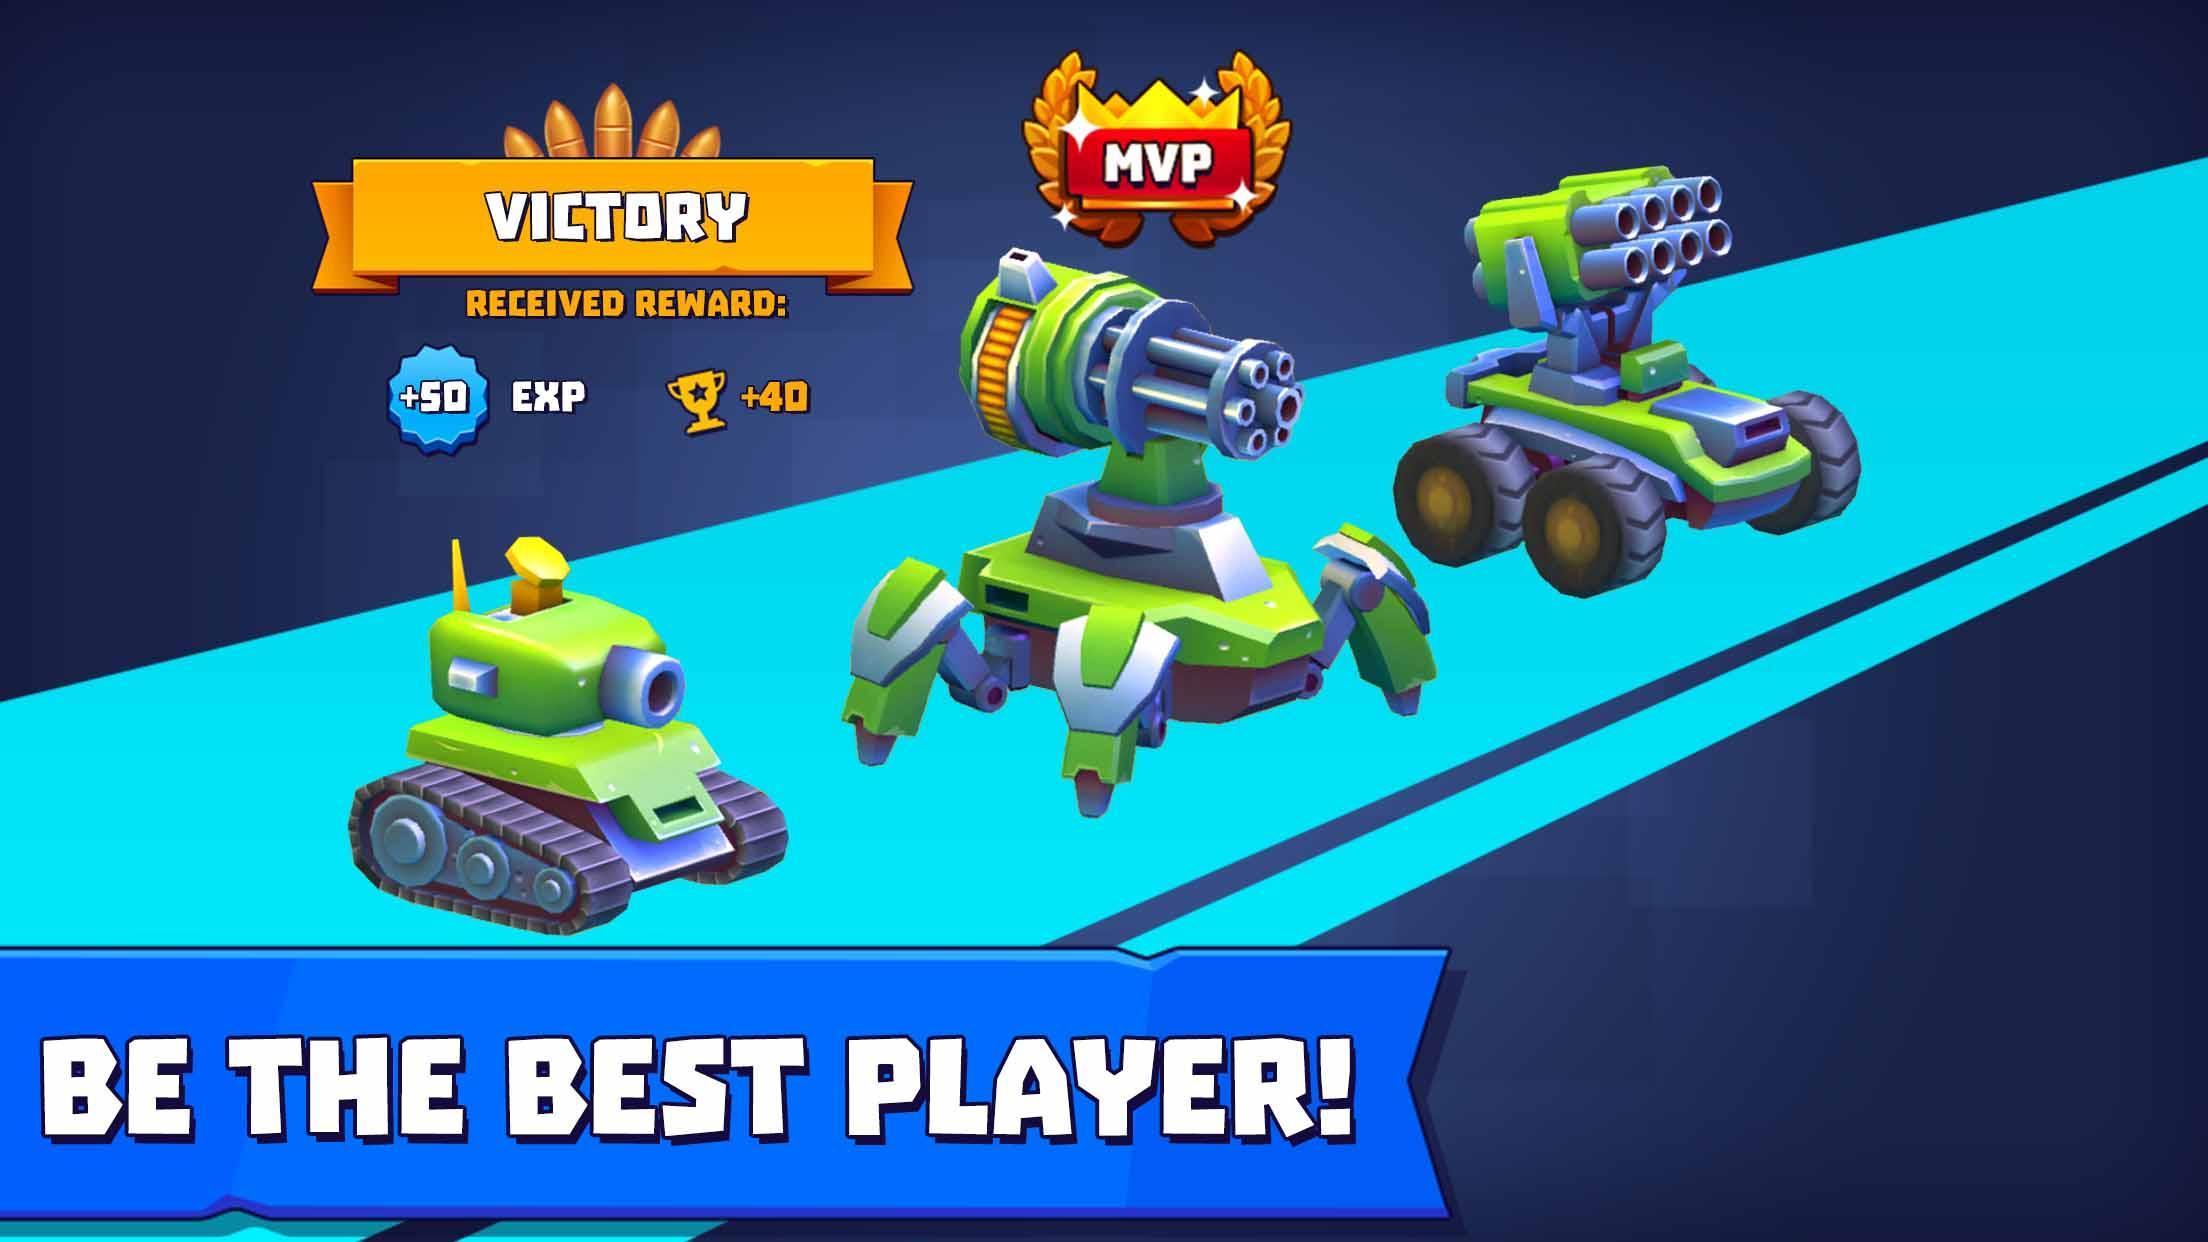 Tanks A Lot! - Realtime Multiplayer Battle Arena 2.56 Screenshot 5